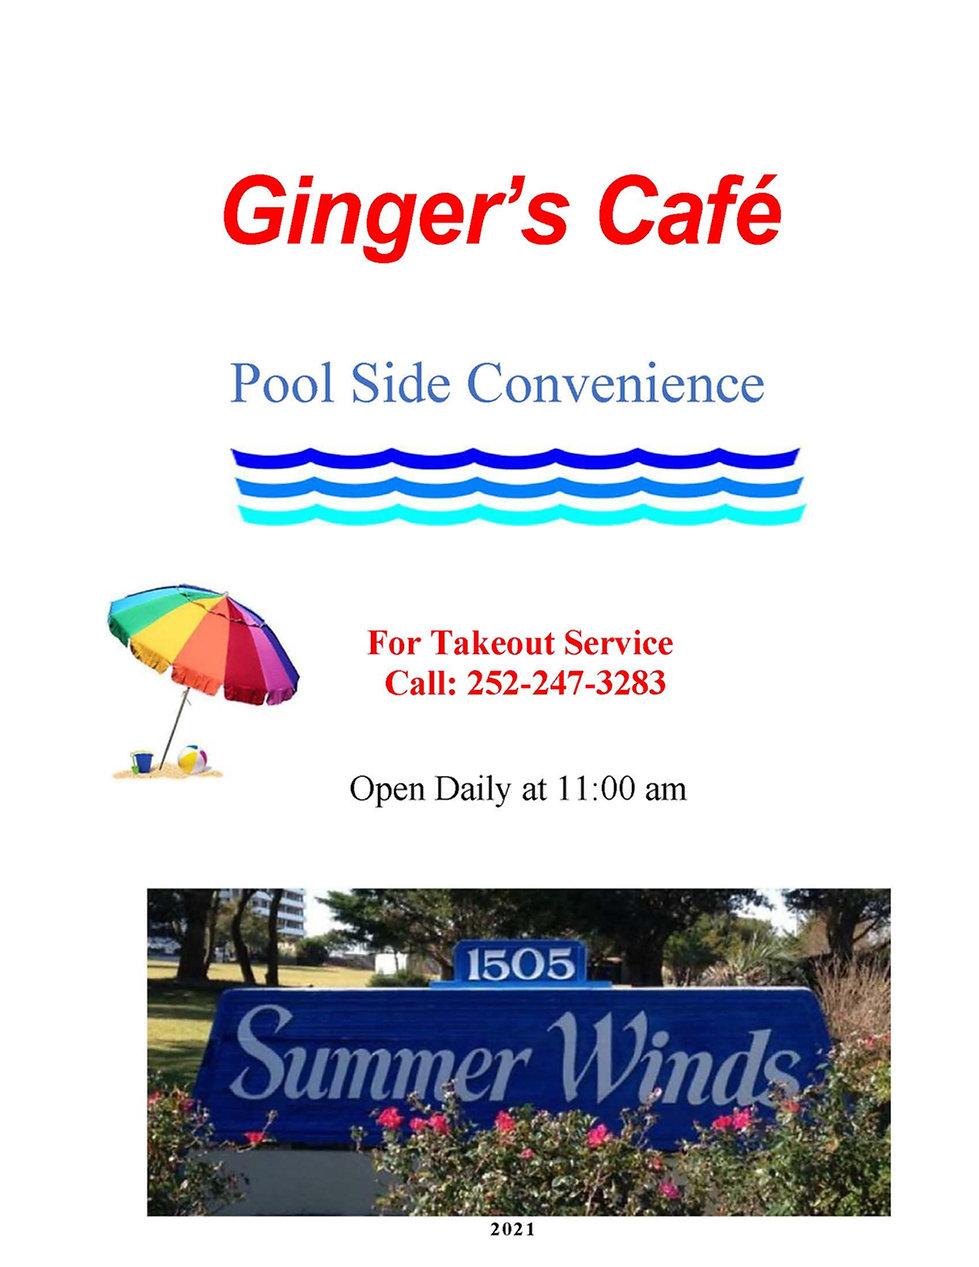 Ginger's Menu 2021_Page_1.jpg